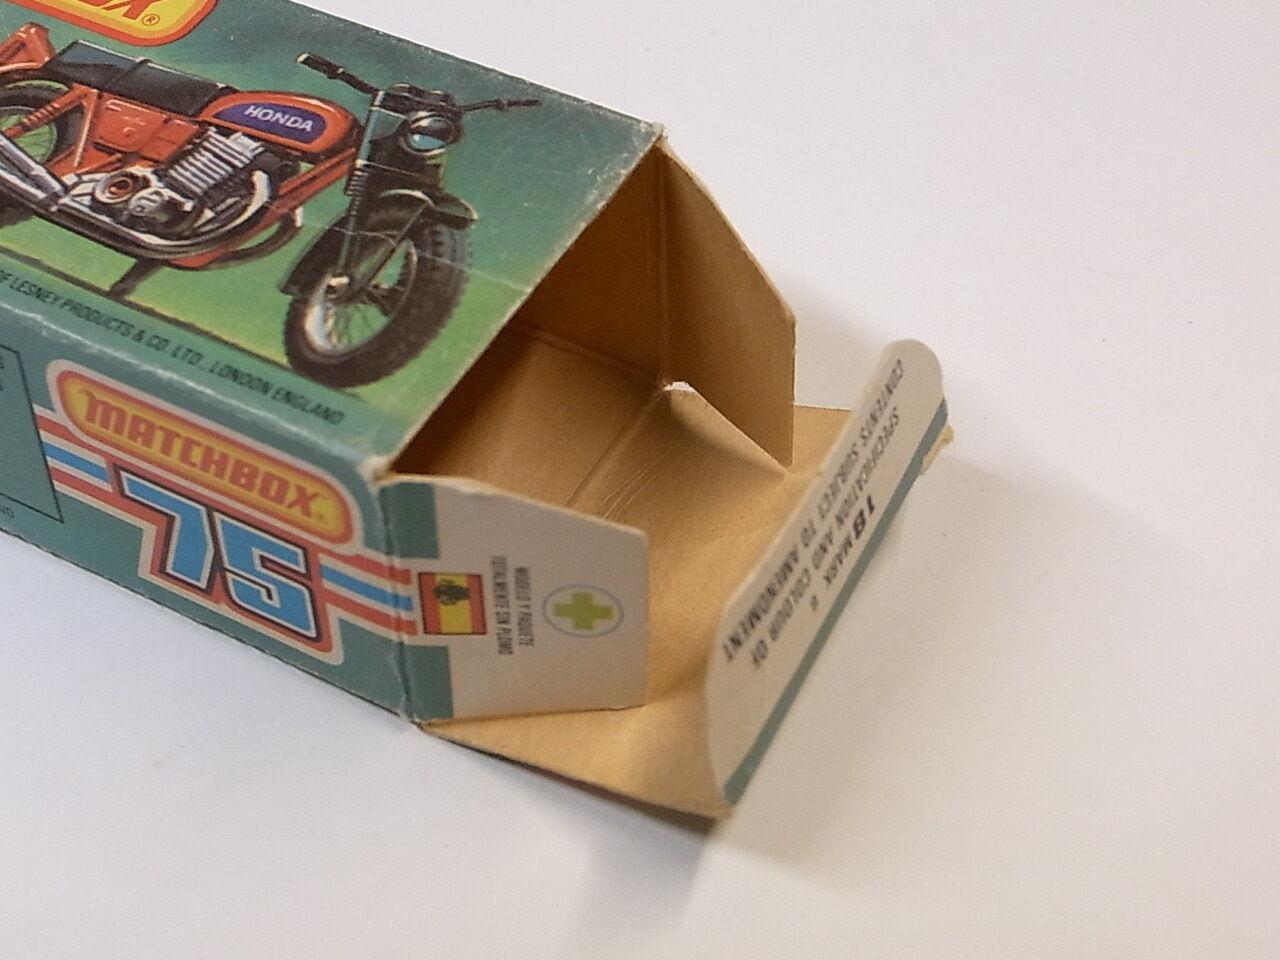 Matchbox Matchbox Matchbox Lesney 18 Hondarora originale Box     Modell Honda CB 750 Four a95041